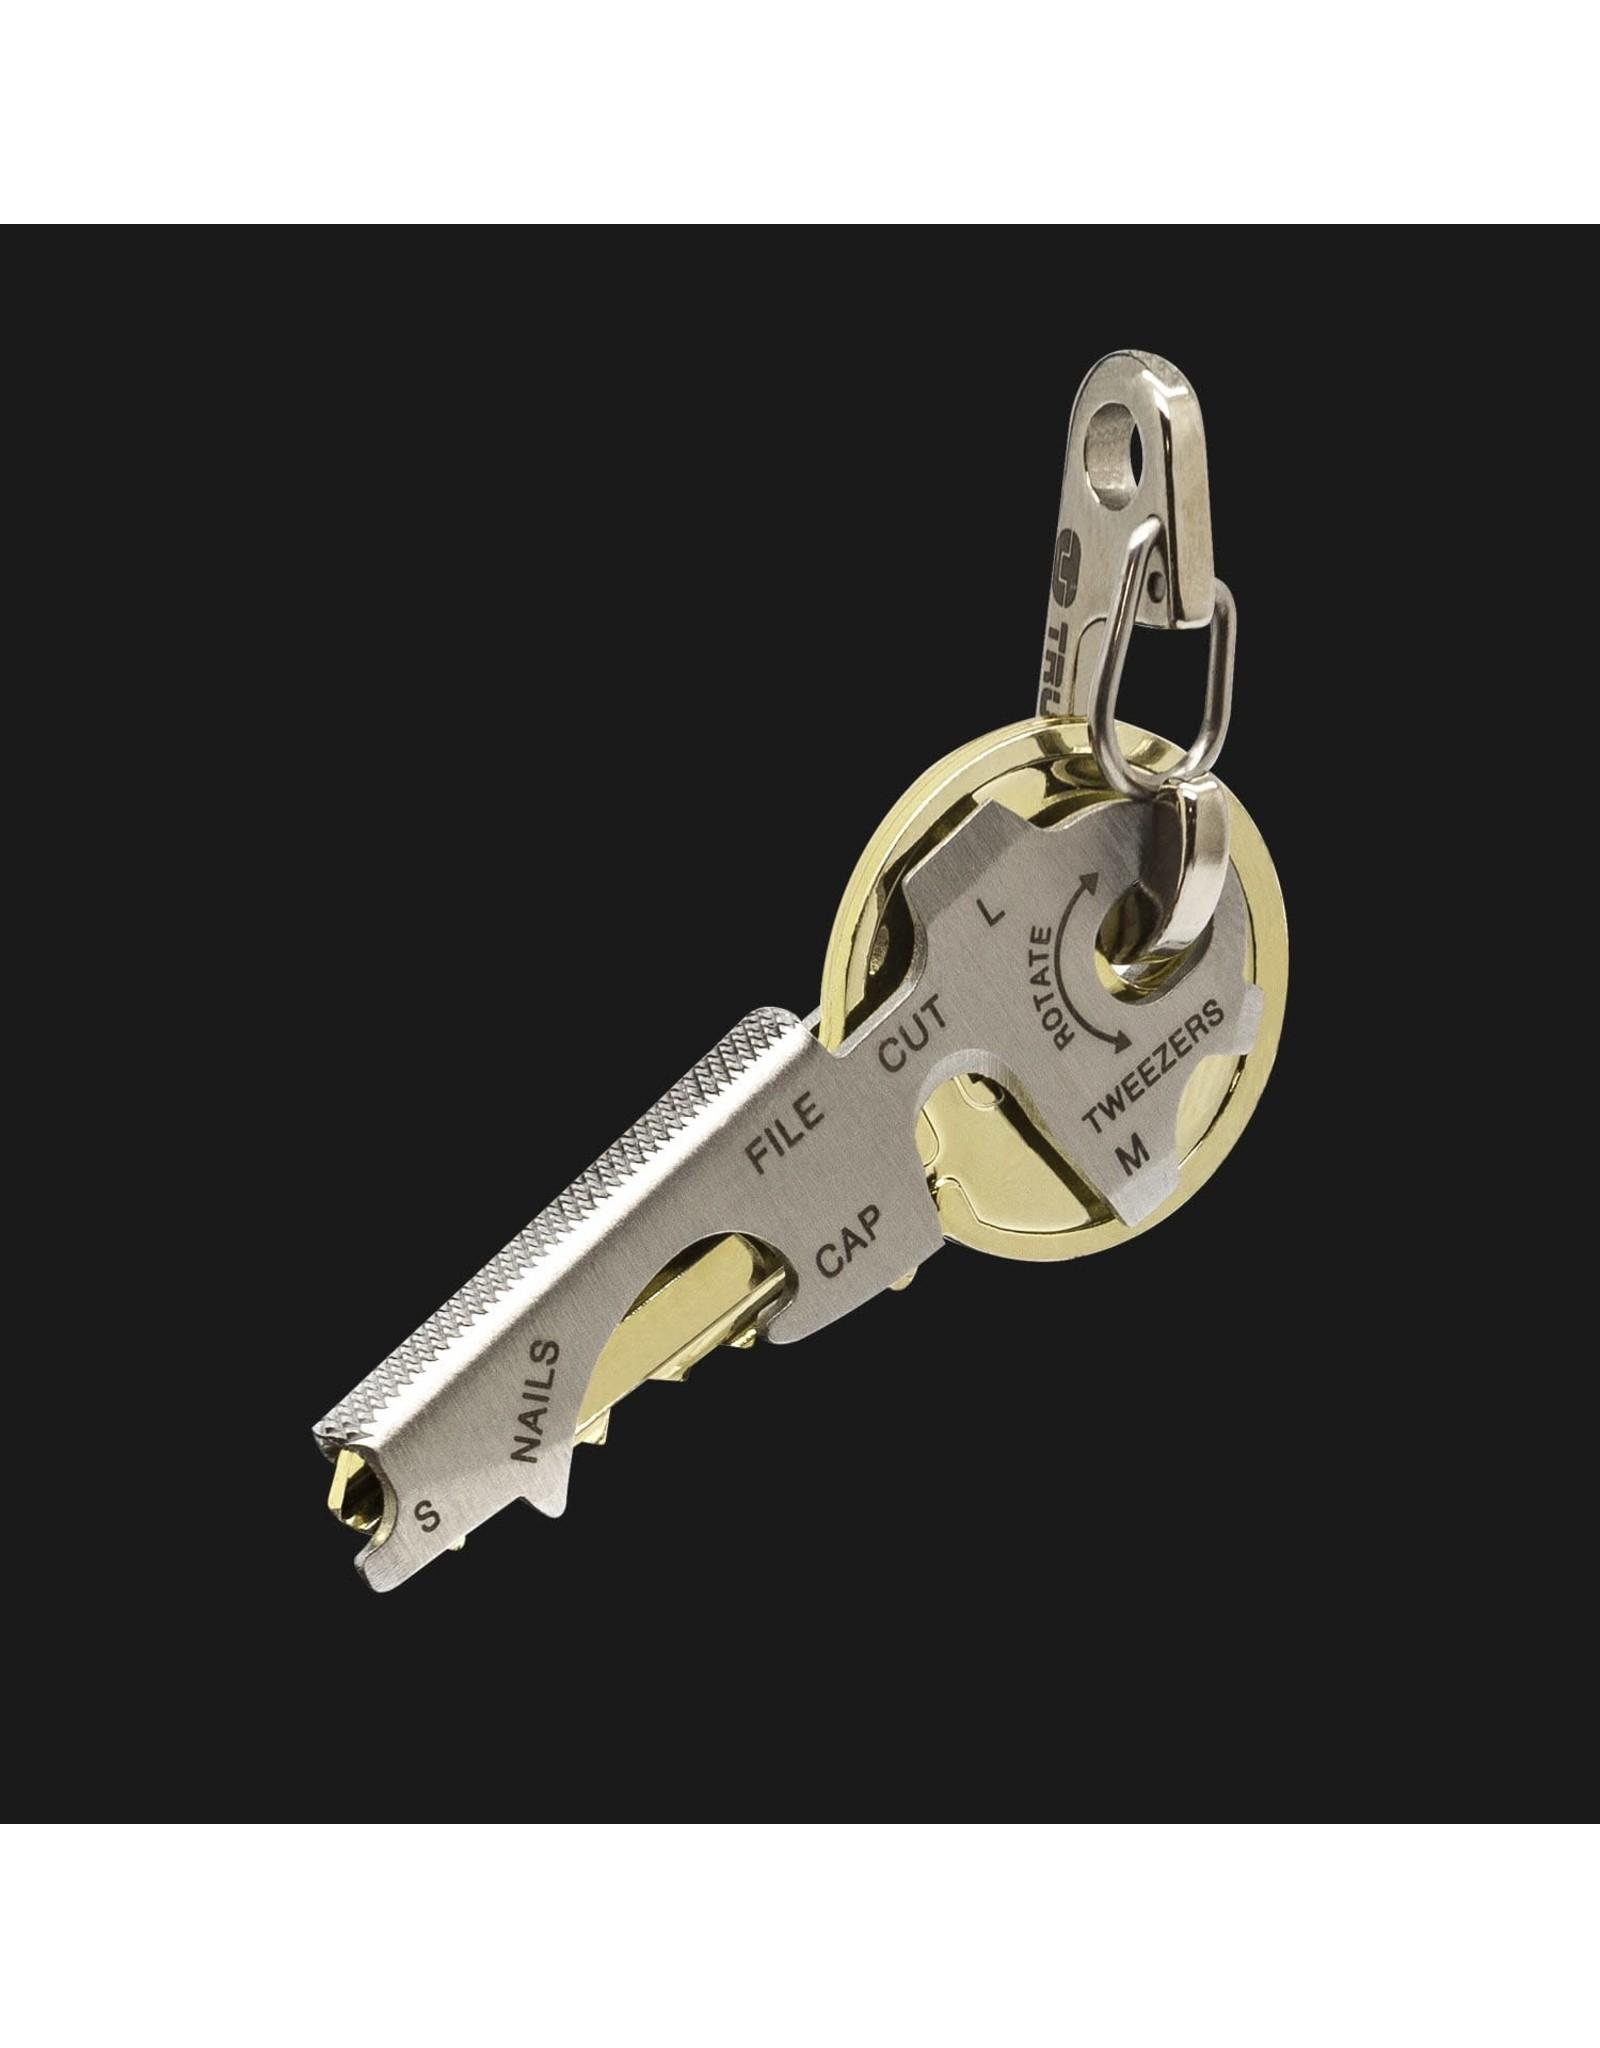 True Utility True Utility Key Tool